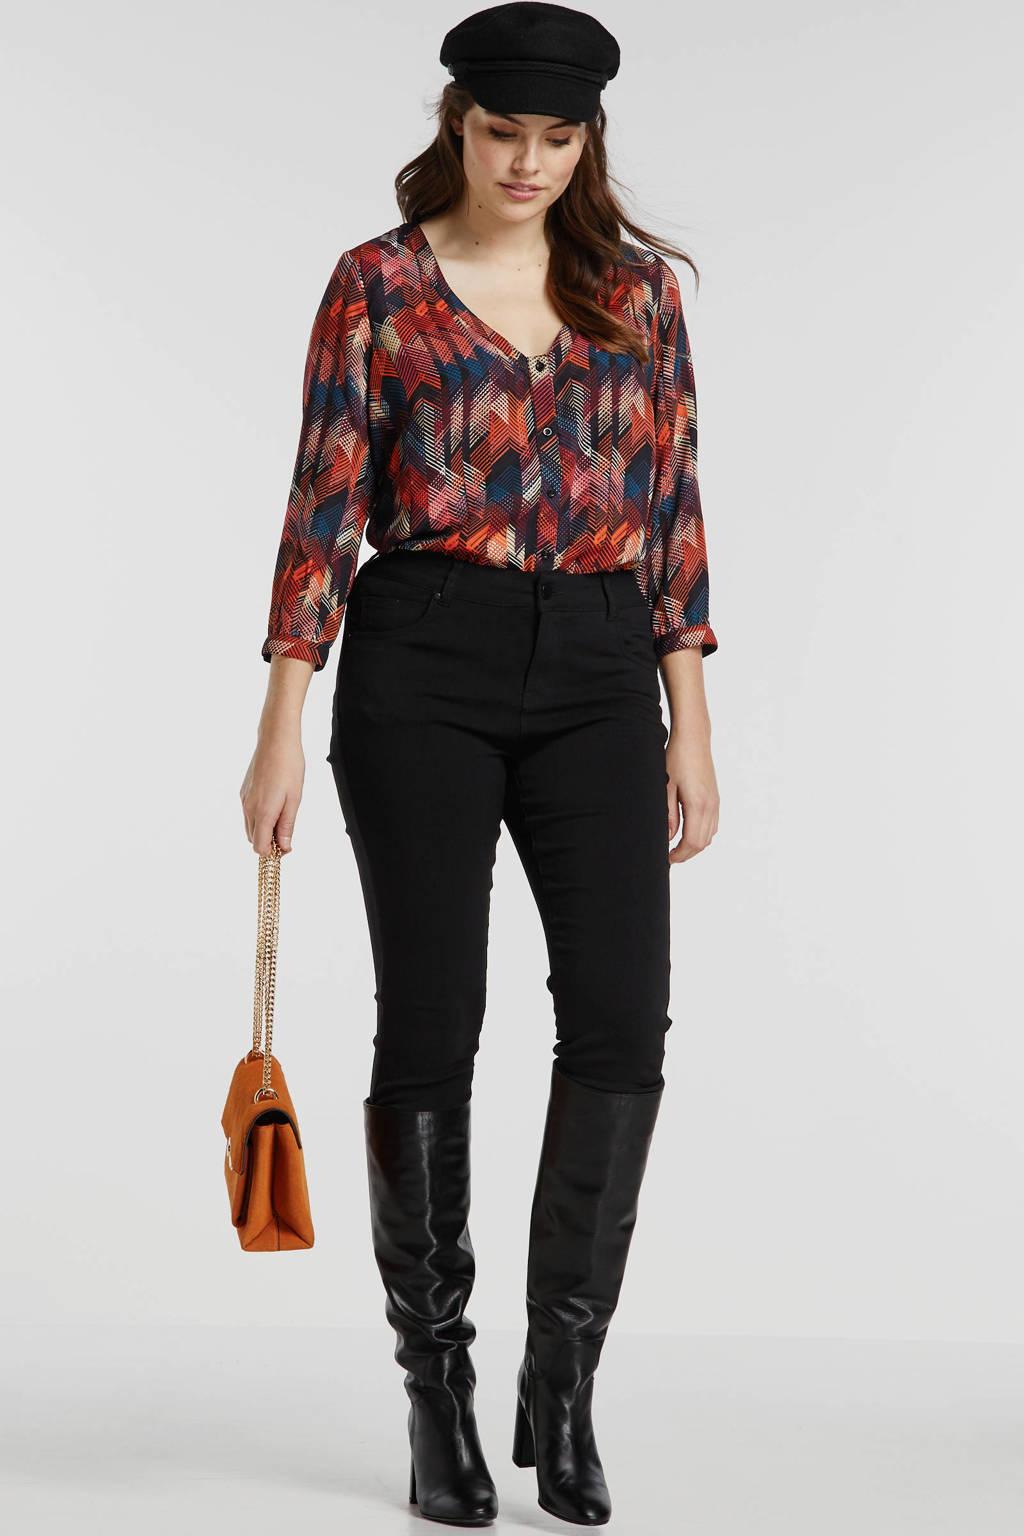 JUNAROSE top met all over print zwart/oranje/blauw, Zwart/oranje/blauw